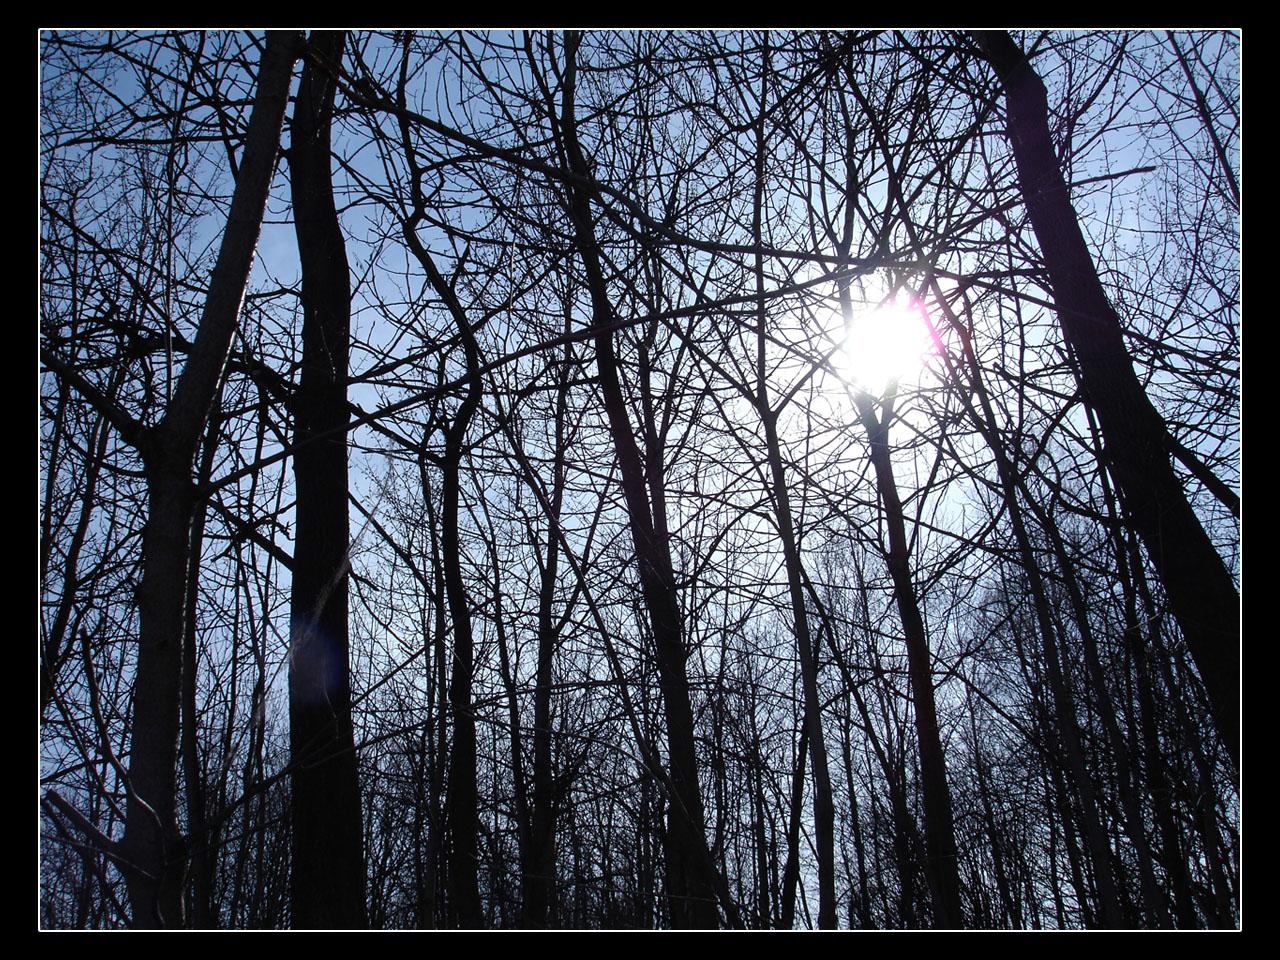 Many trees and sun